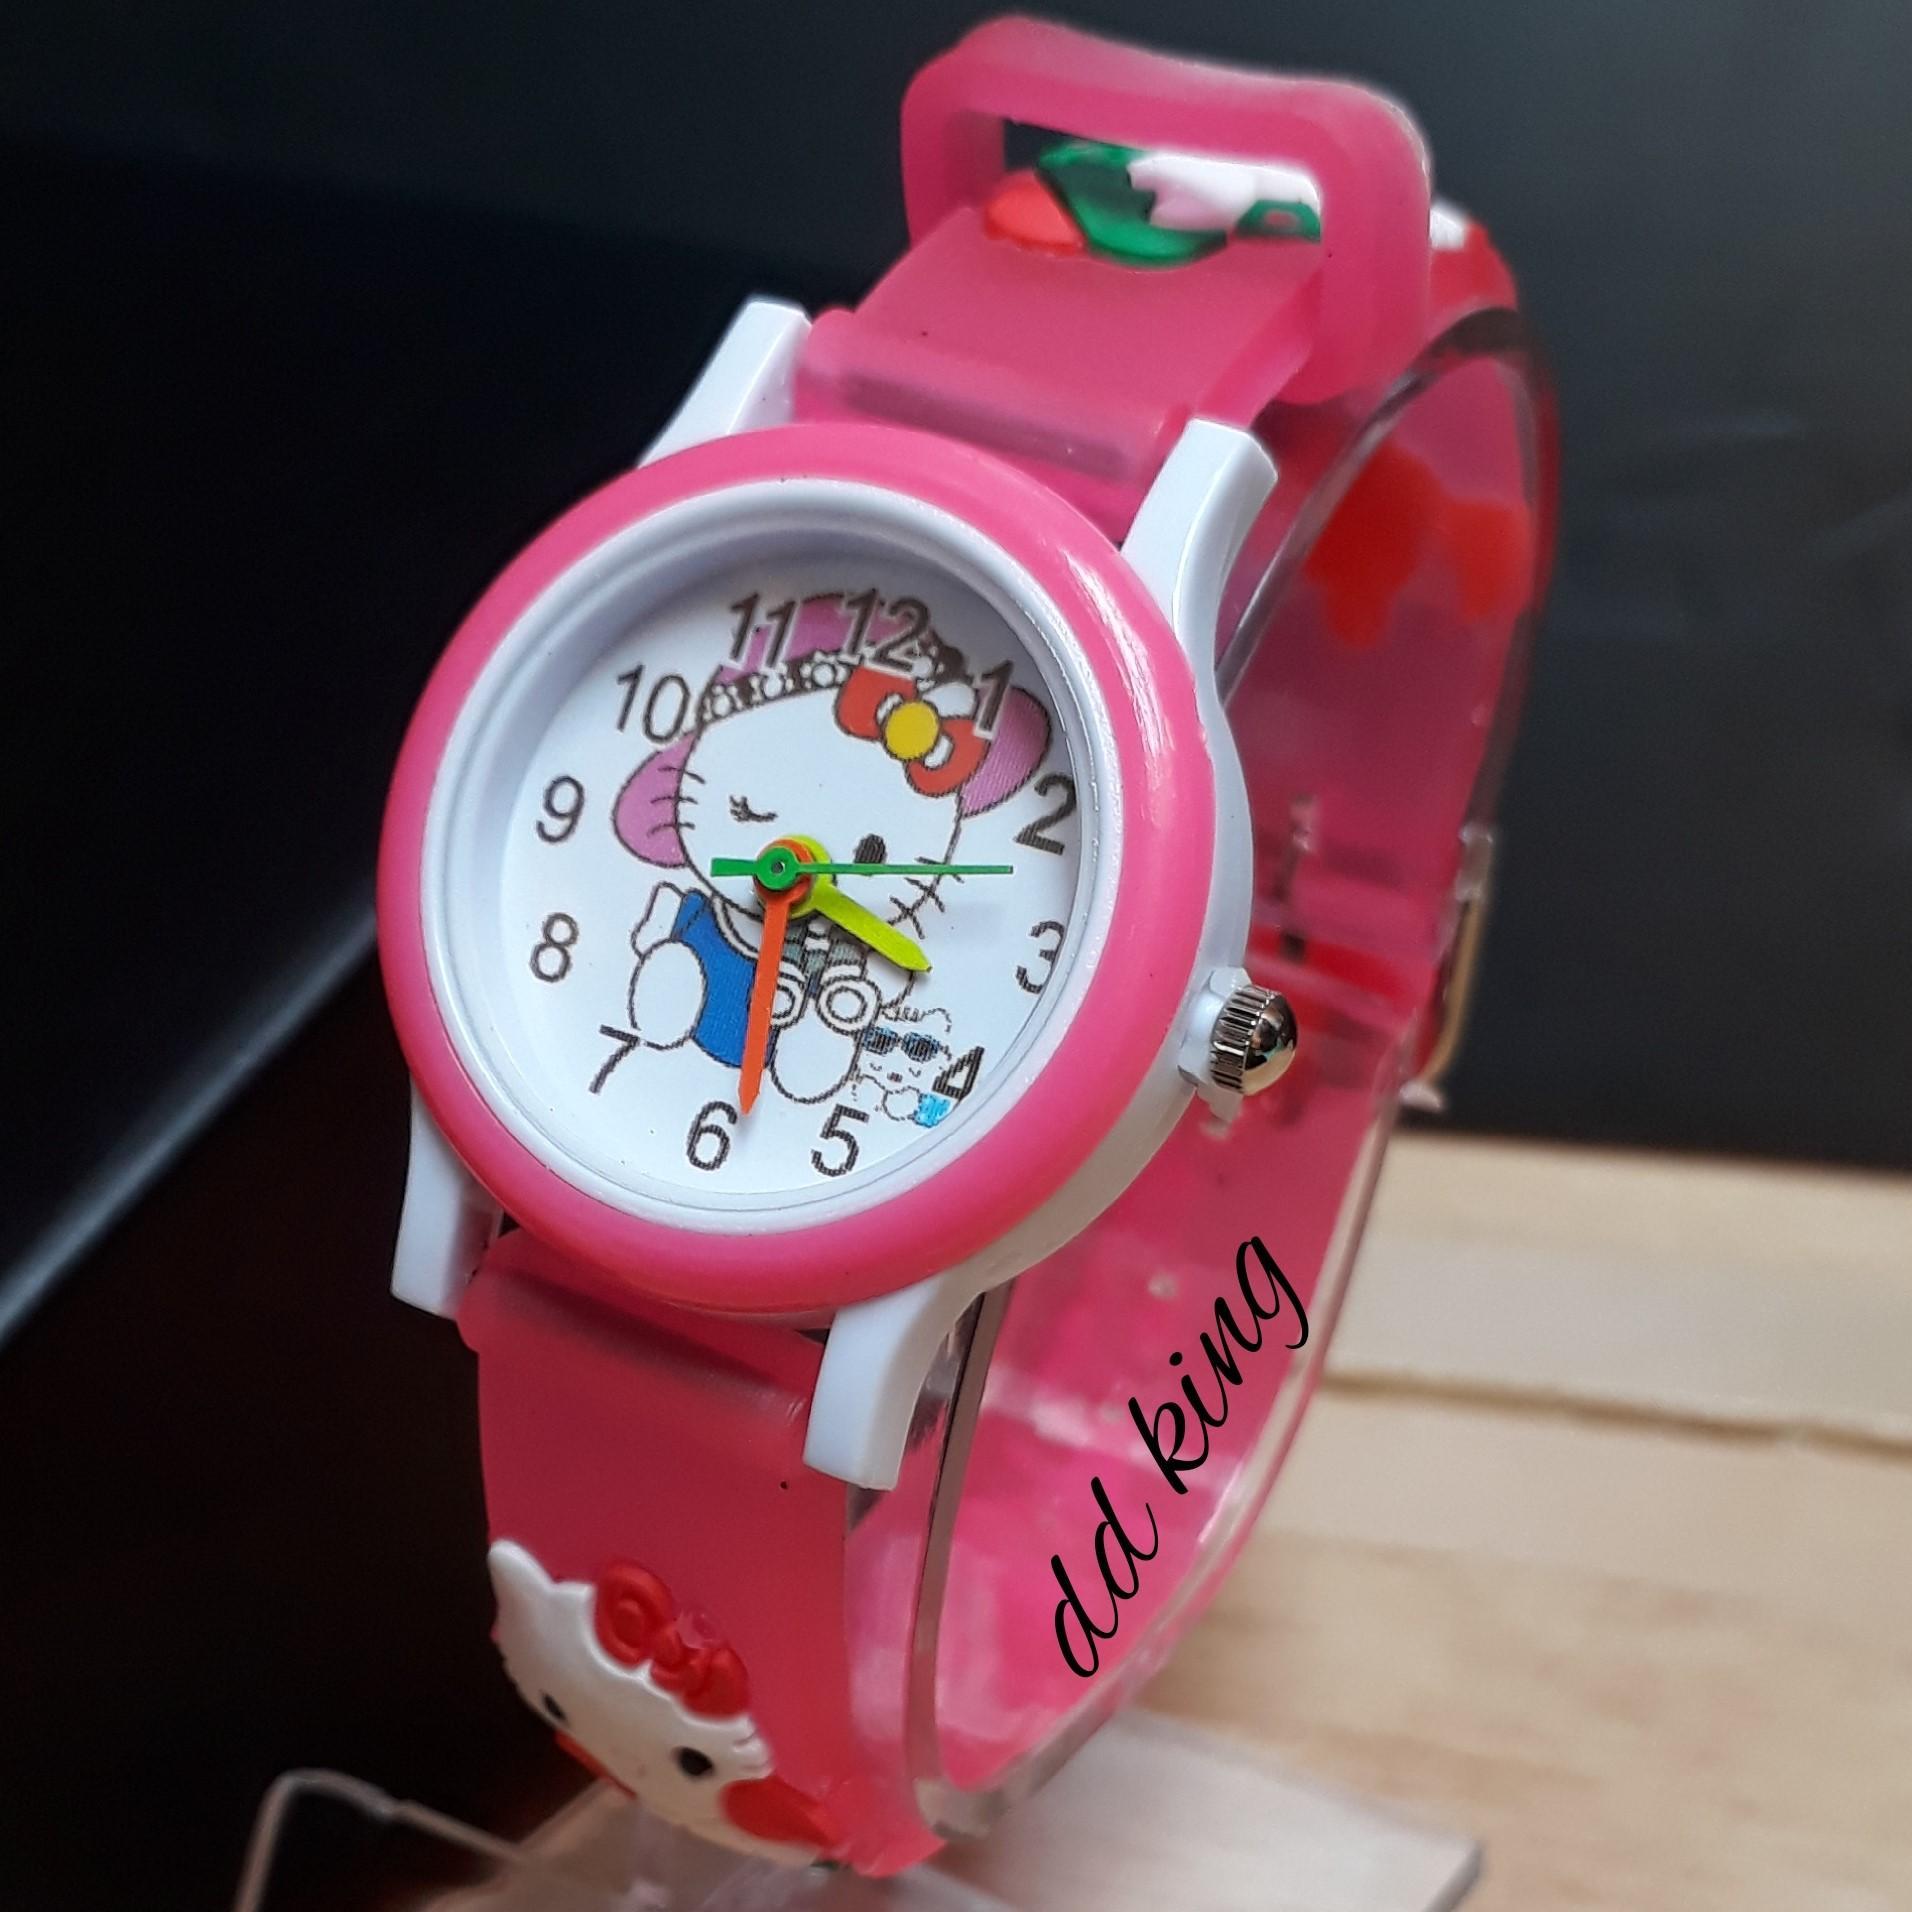 Shock Price jam tangan anak lucu best price - Hanya Rp20.194 60b69a5fc3